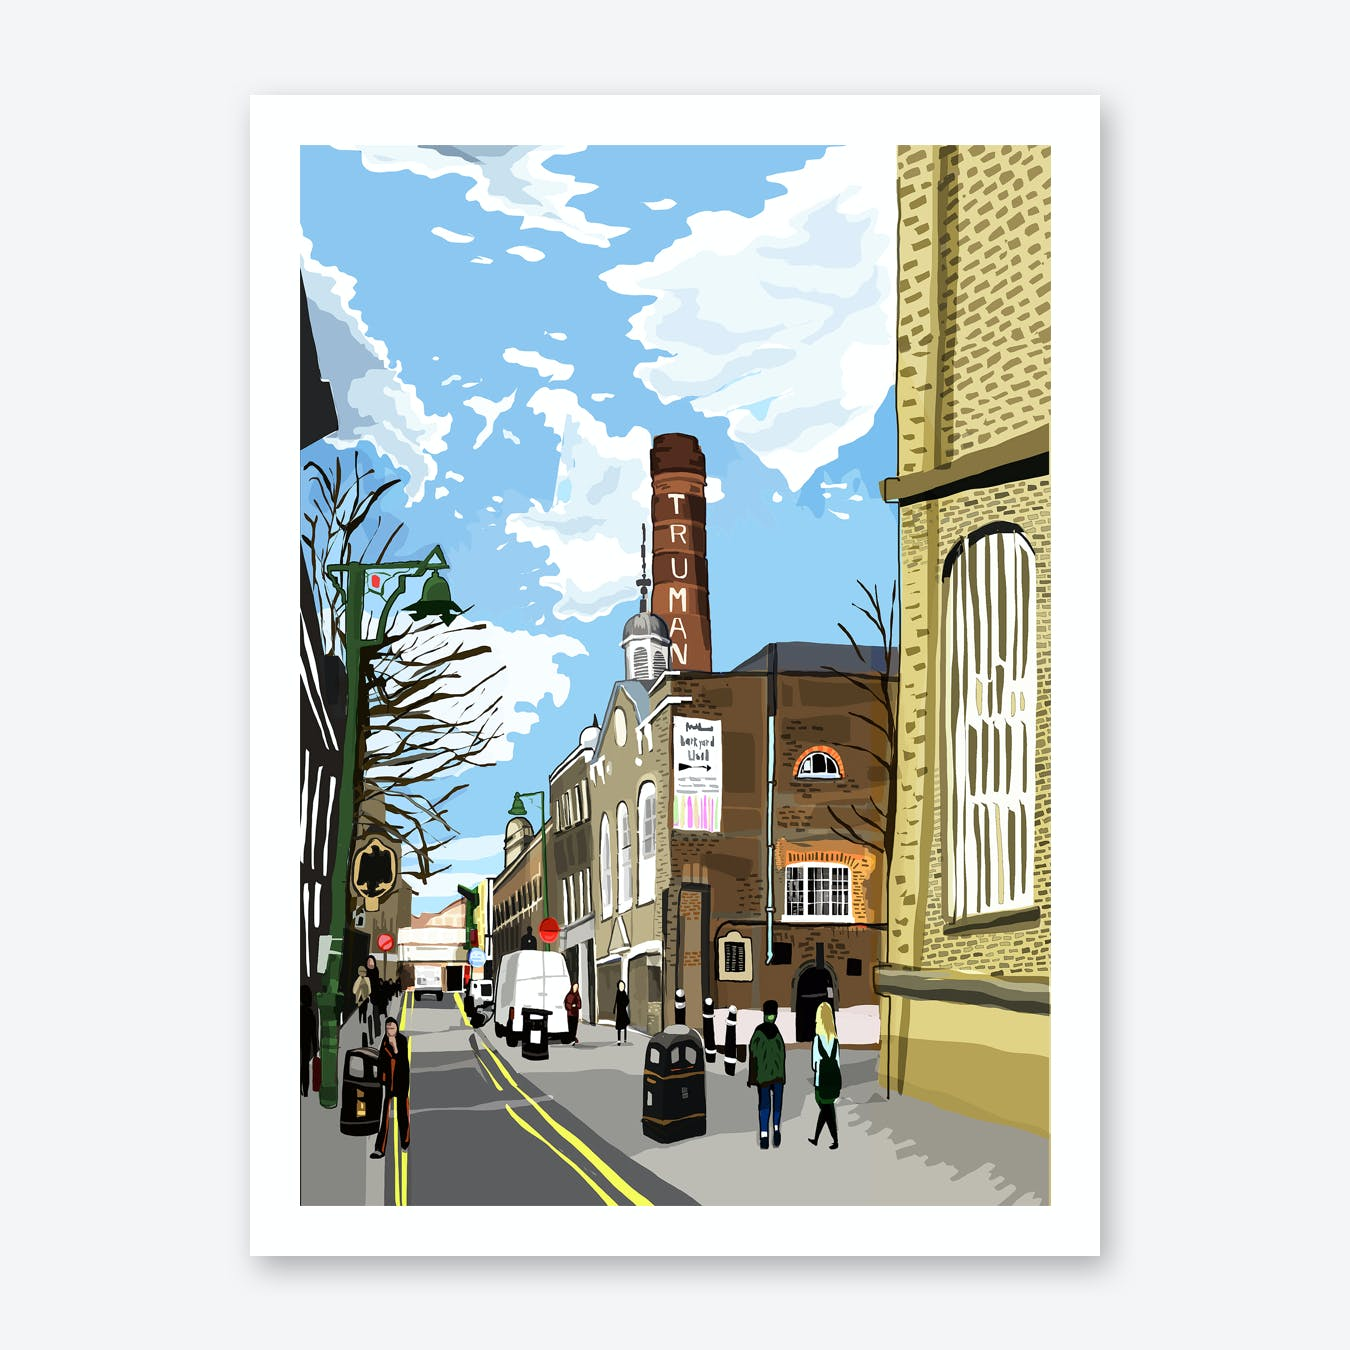 Truman Brewery, Brick Lane, East London A3 Print